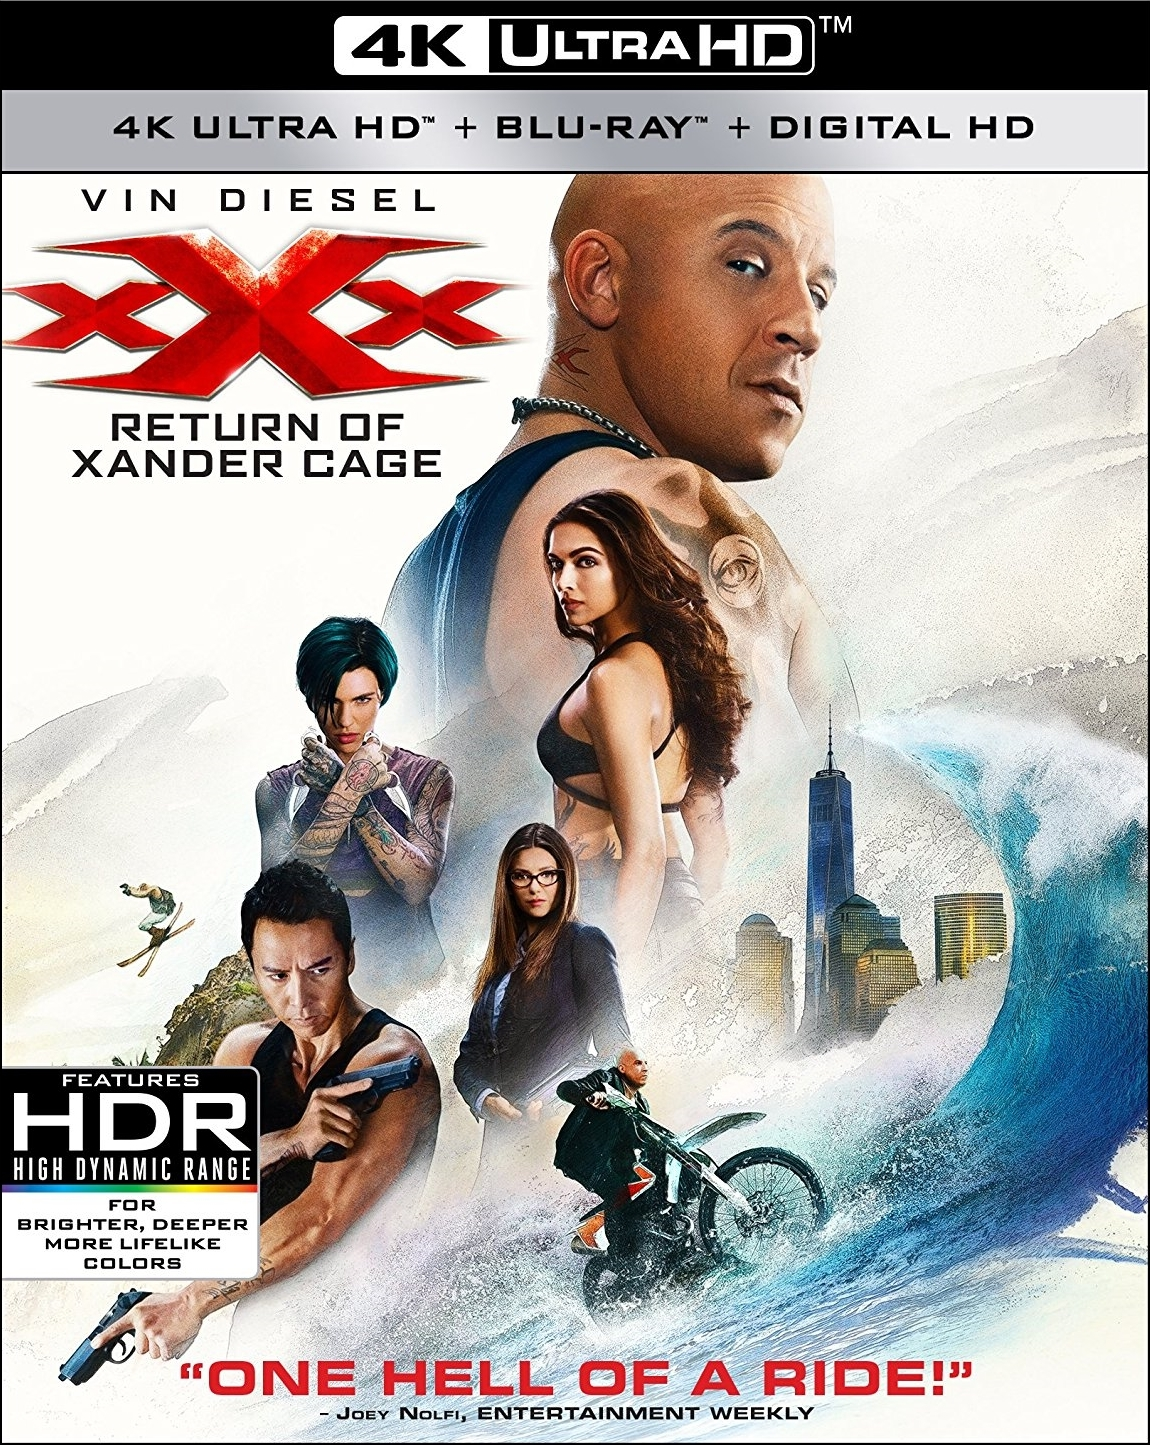 xXx: Return of Xander Cage 4K (2017) 4K Ultra HD Blu-ray